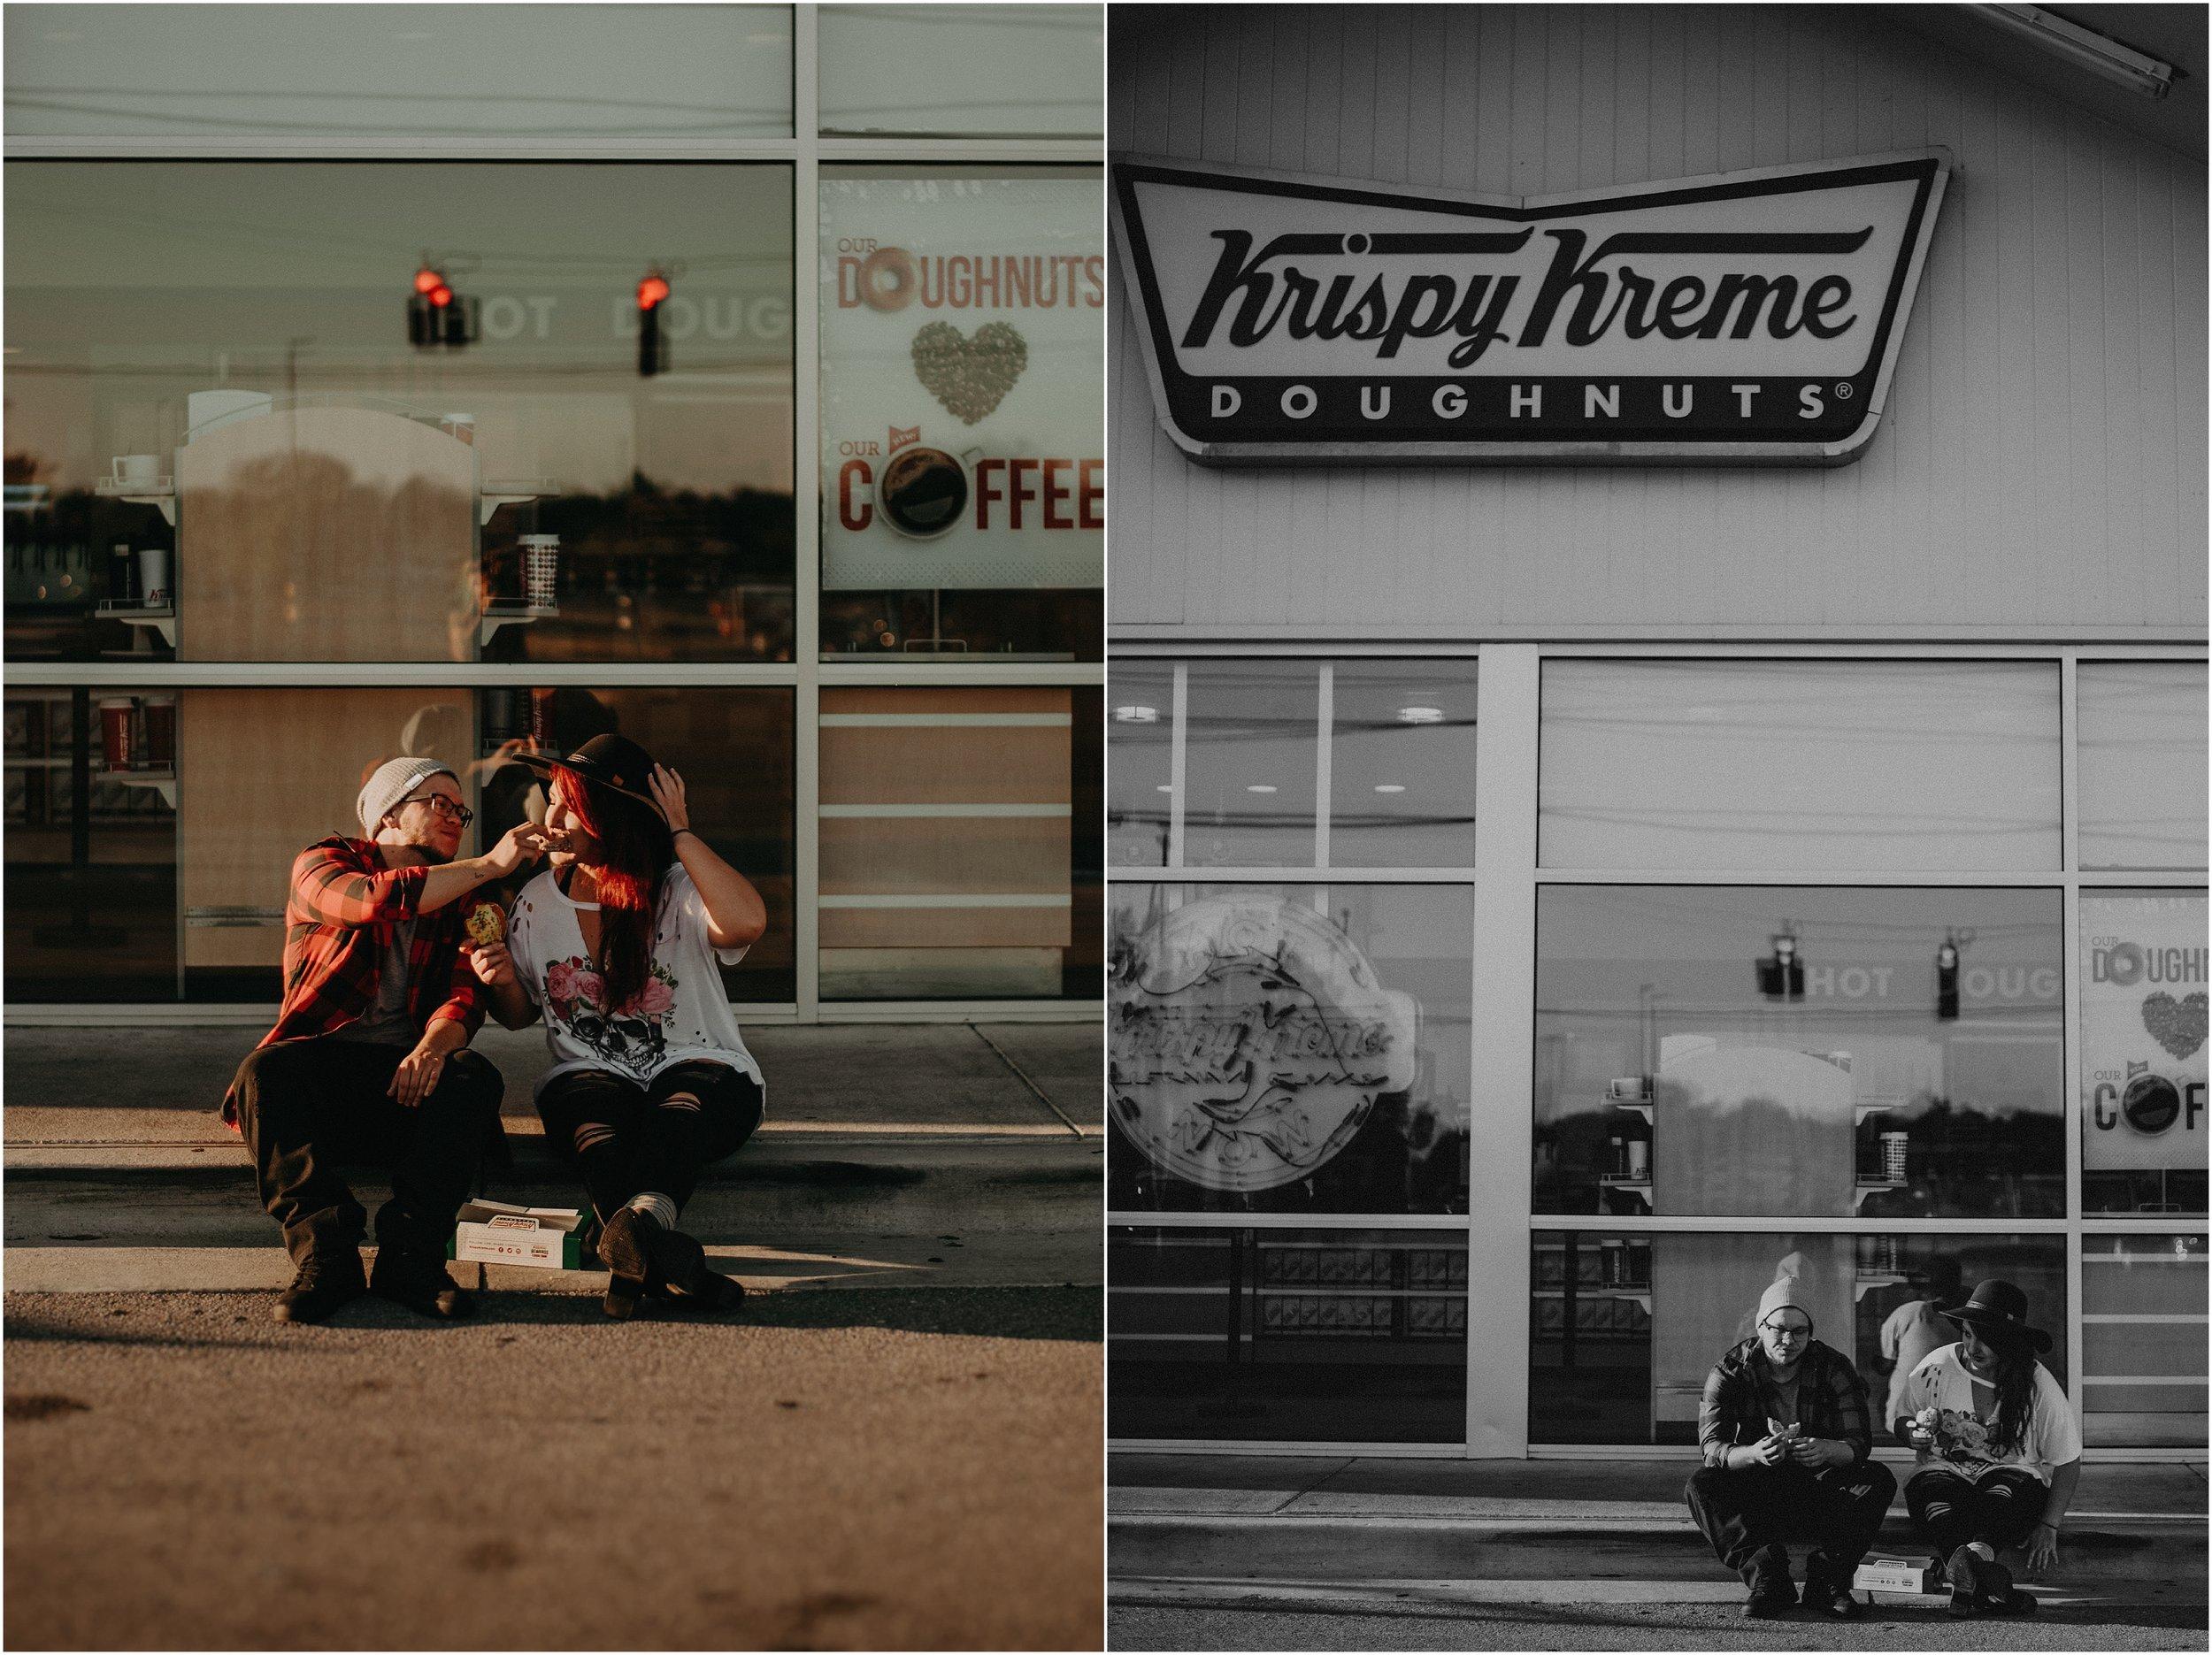 Sitting outside of Krispy Kreme Doughnuts eating doughnuts in the parking lot